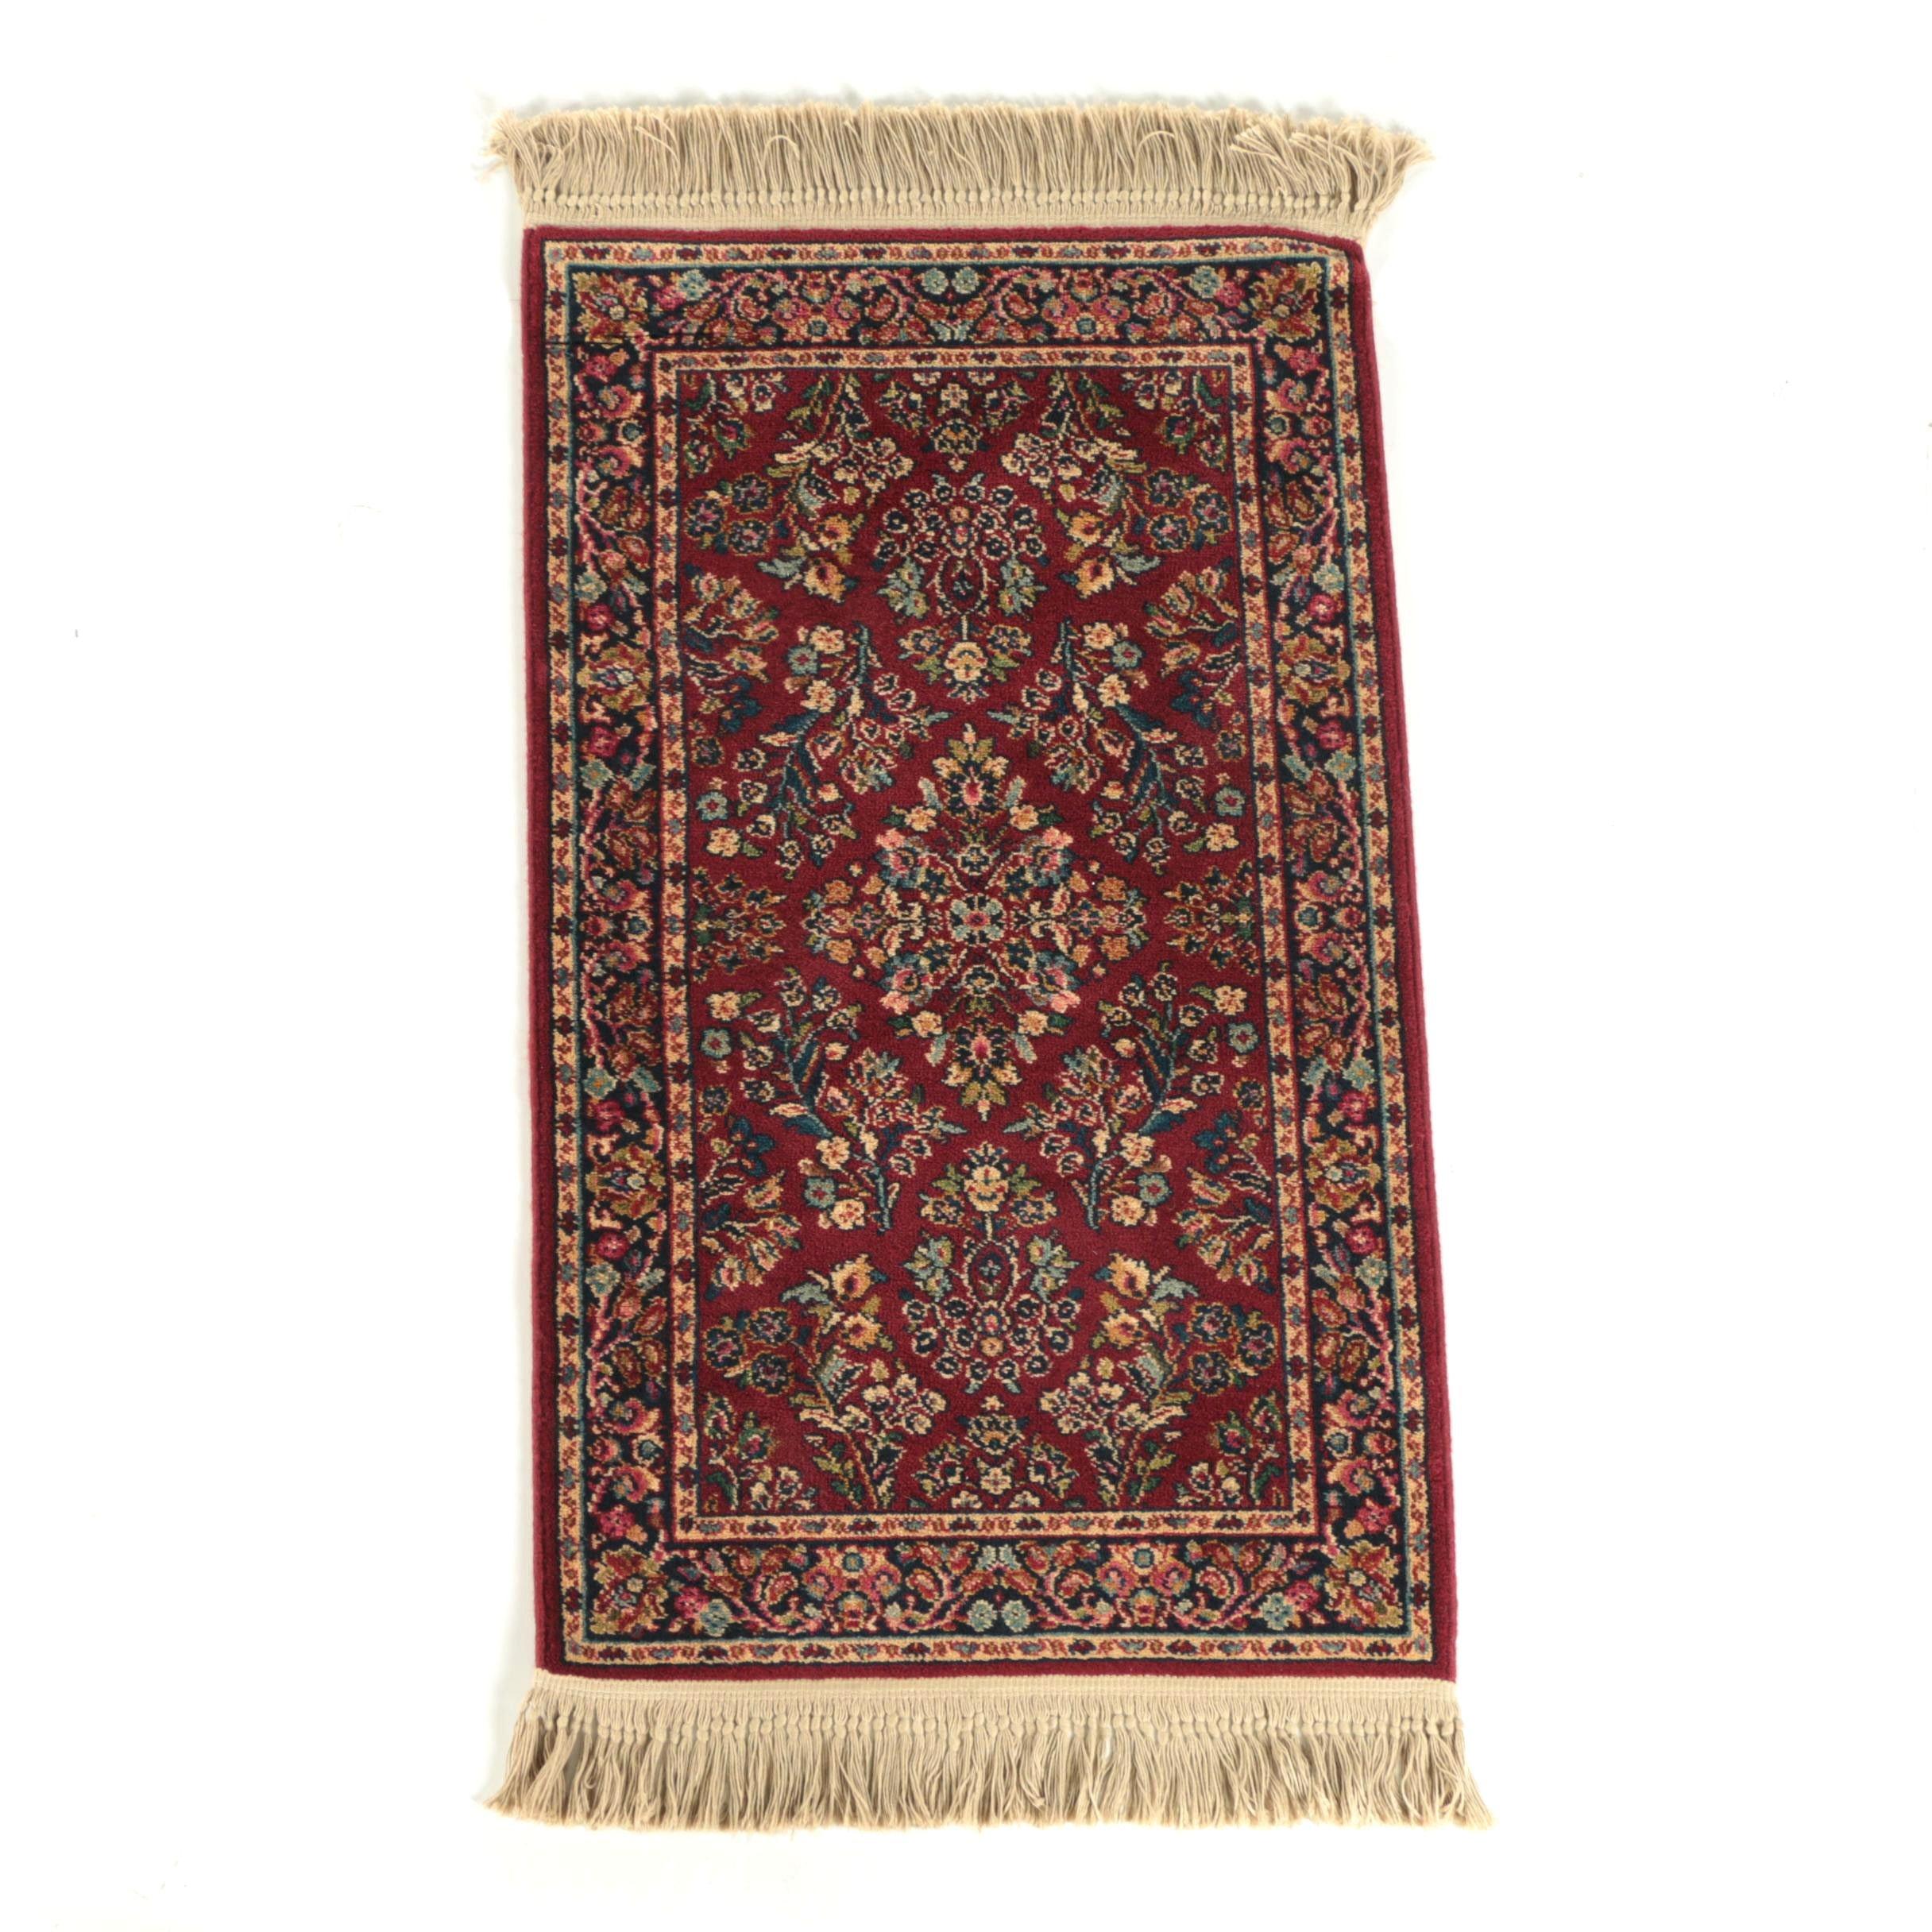 "Power-Loomed Karastan ""Sarouk"" Wool Accent Rug"